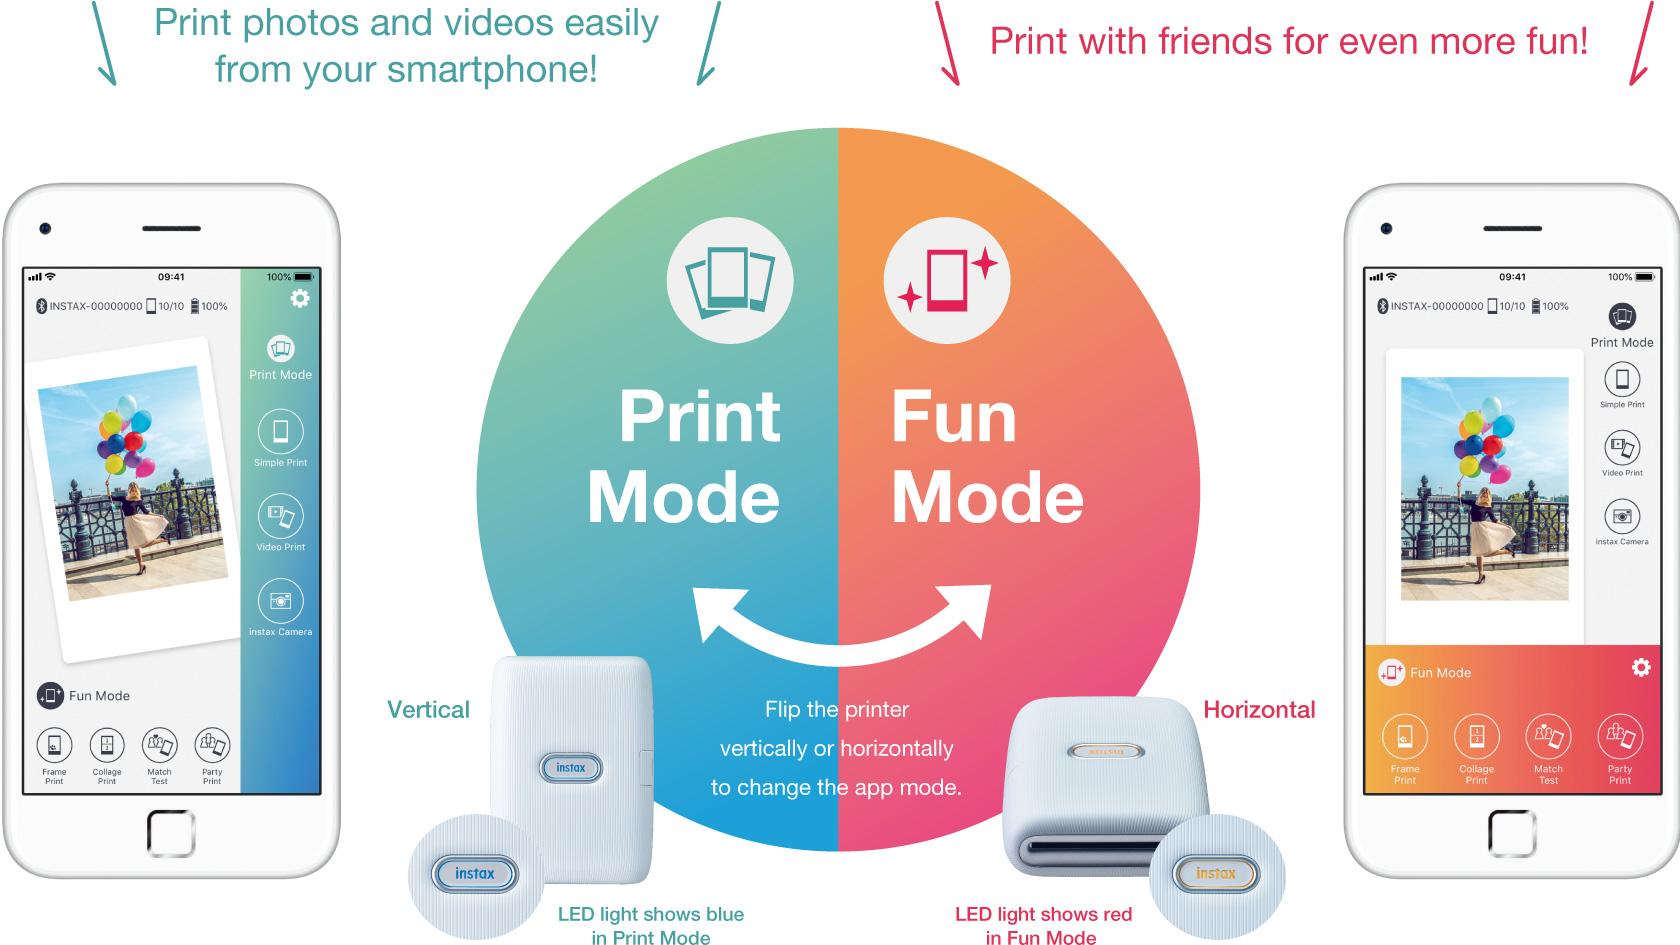 [image] Flip printer vertically for Print Mode and horizontally for Fun Mode